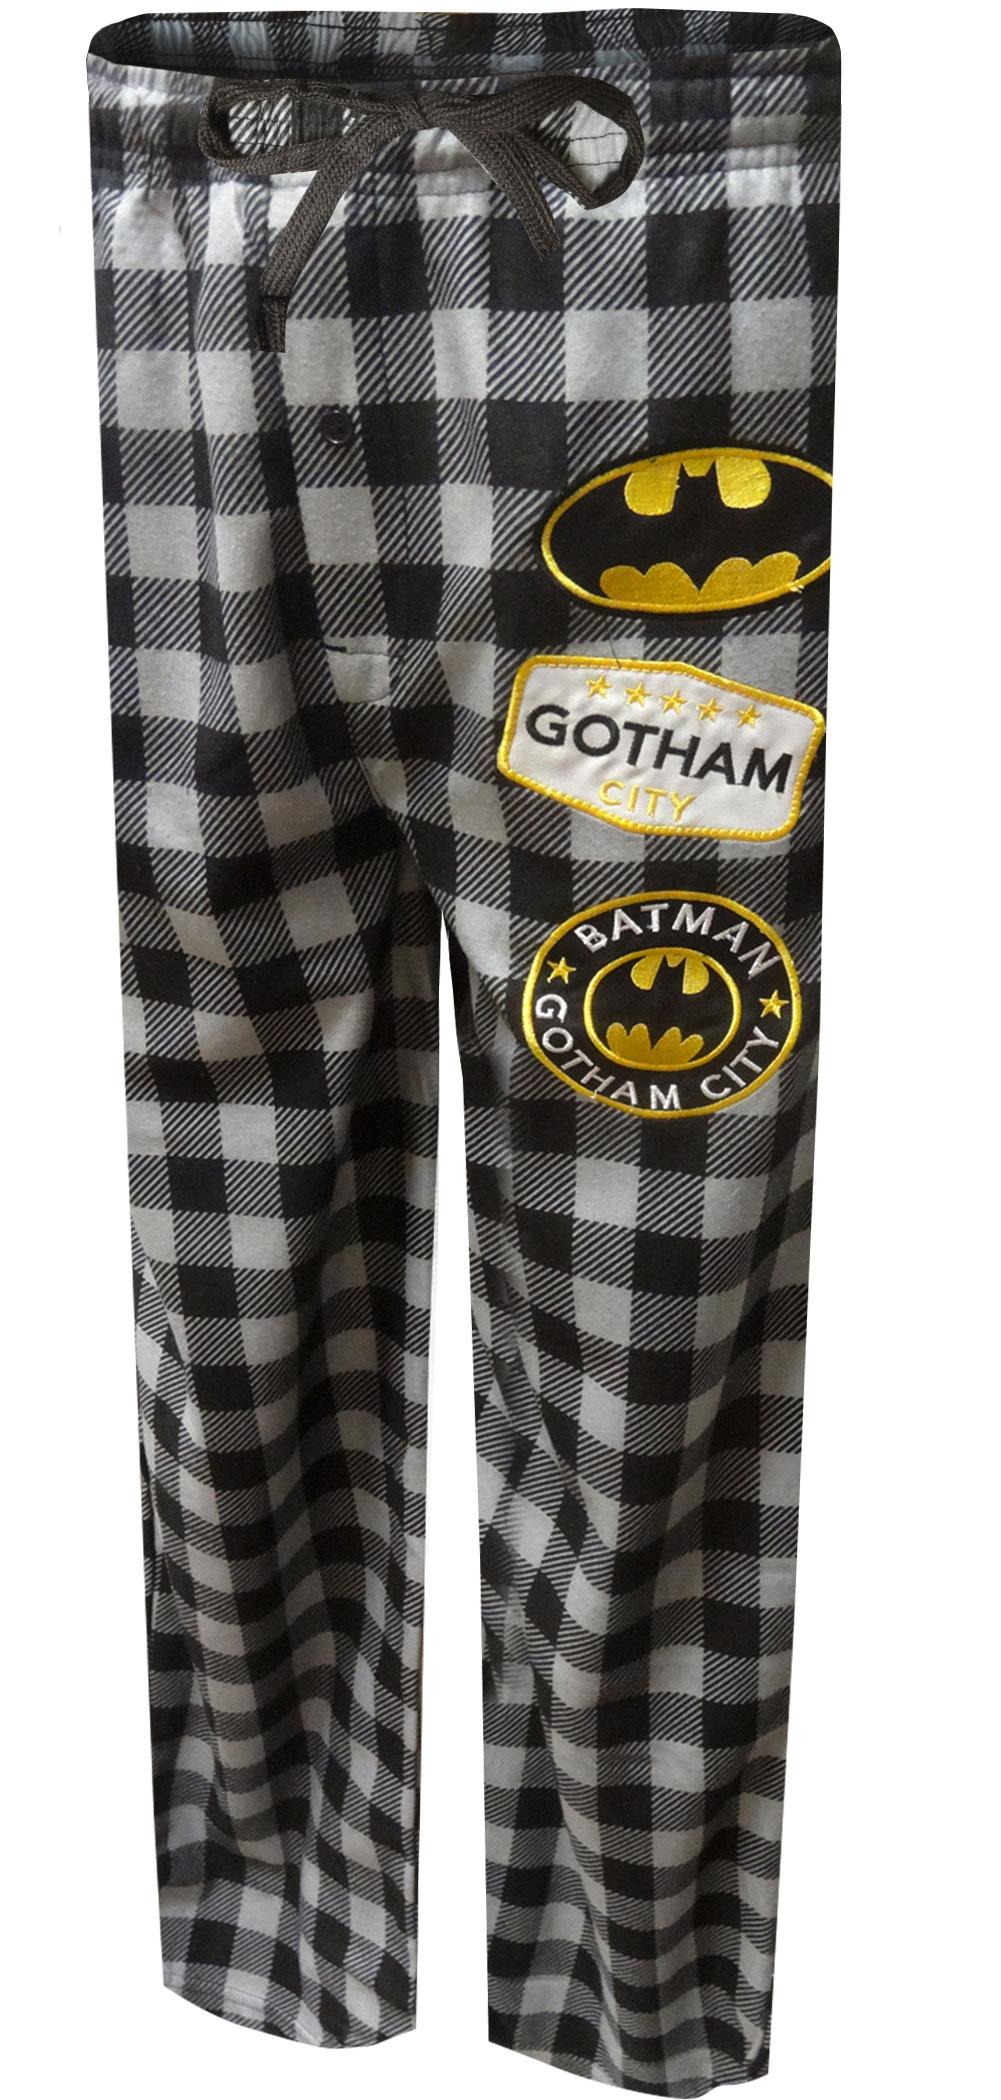 Image of Batman Modern Flannel Buffalo Plaid Lounge Pants for men